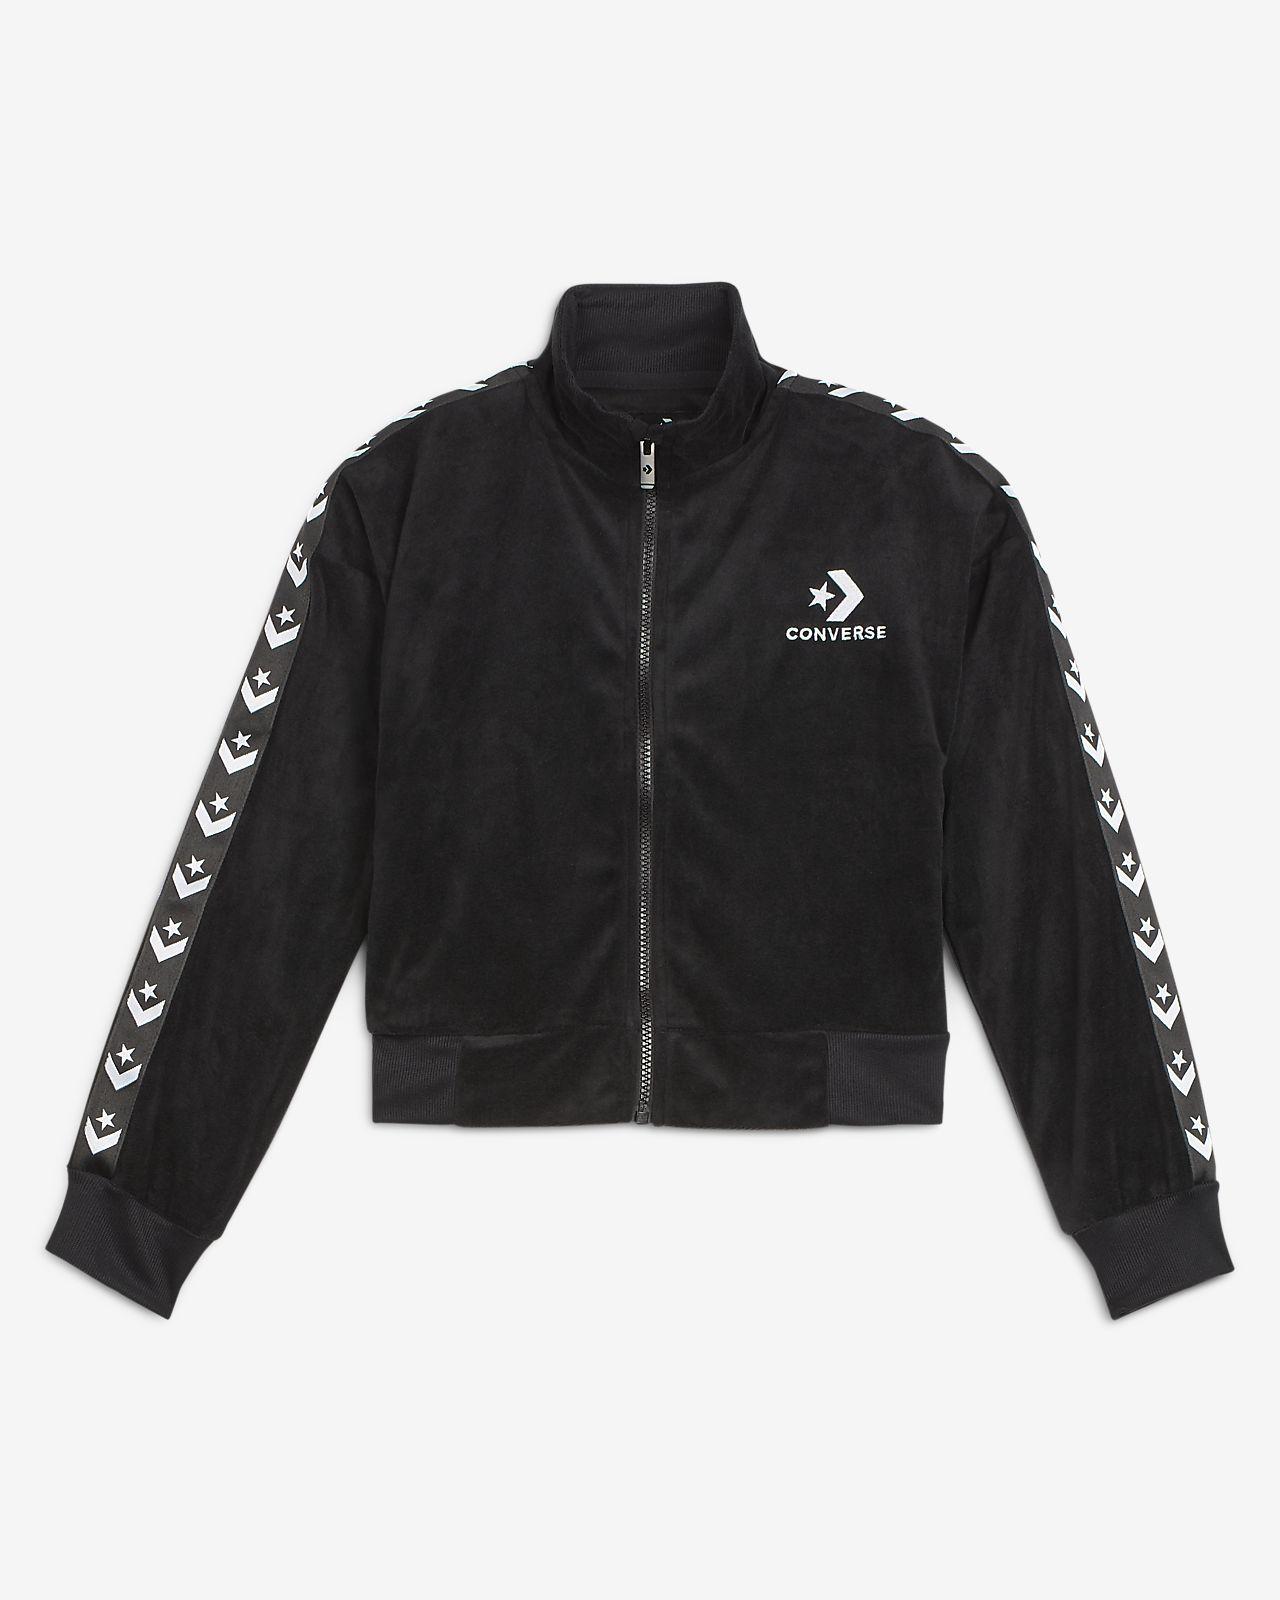 Converse Star Chevron Big Kids' (Girls') Velour Track Jacket